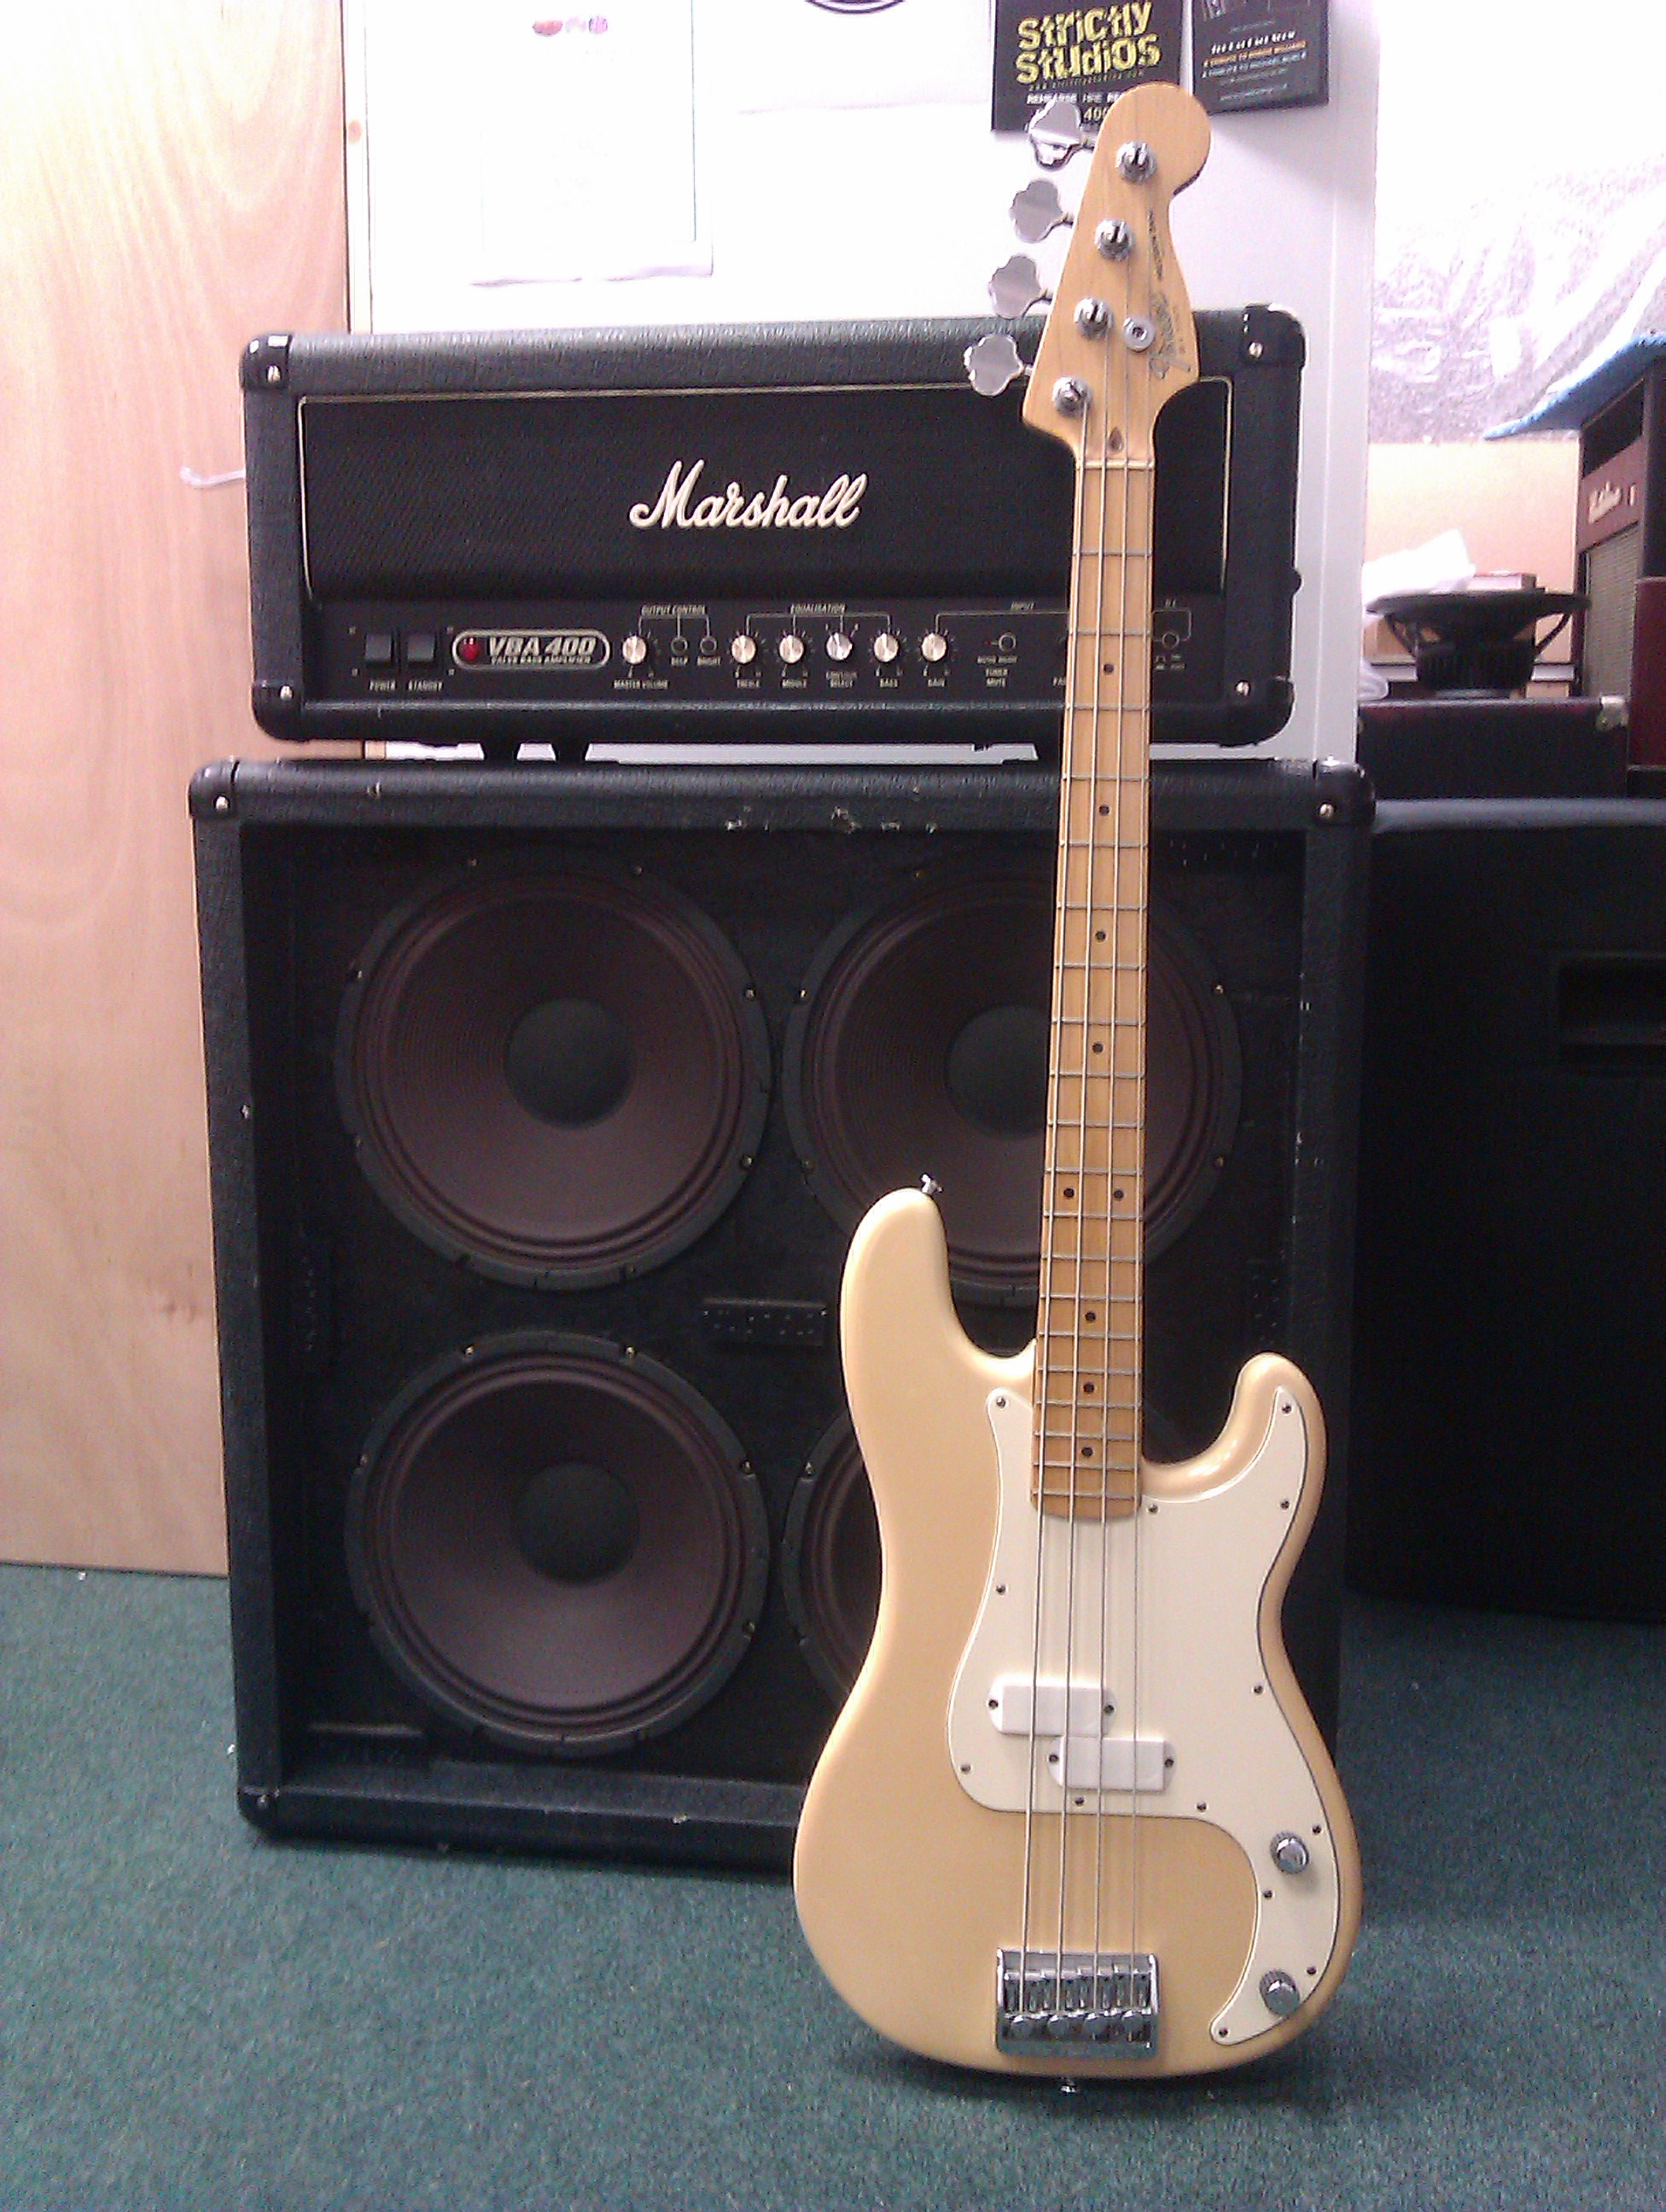 Marshall VBA400 4x12 rig with Fender Elite Precision Bass